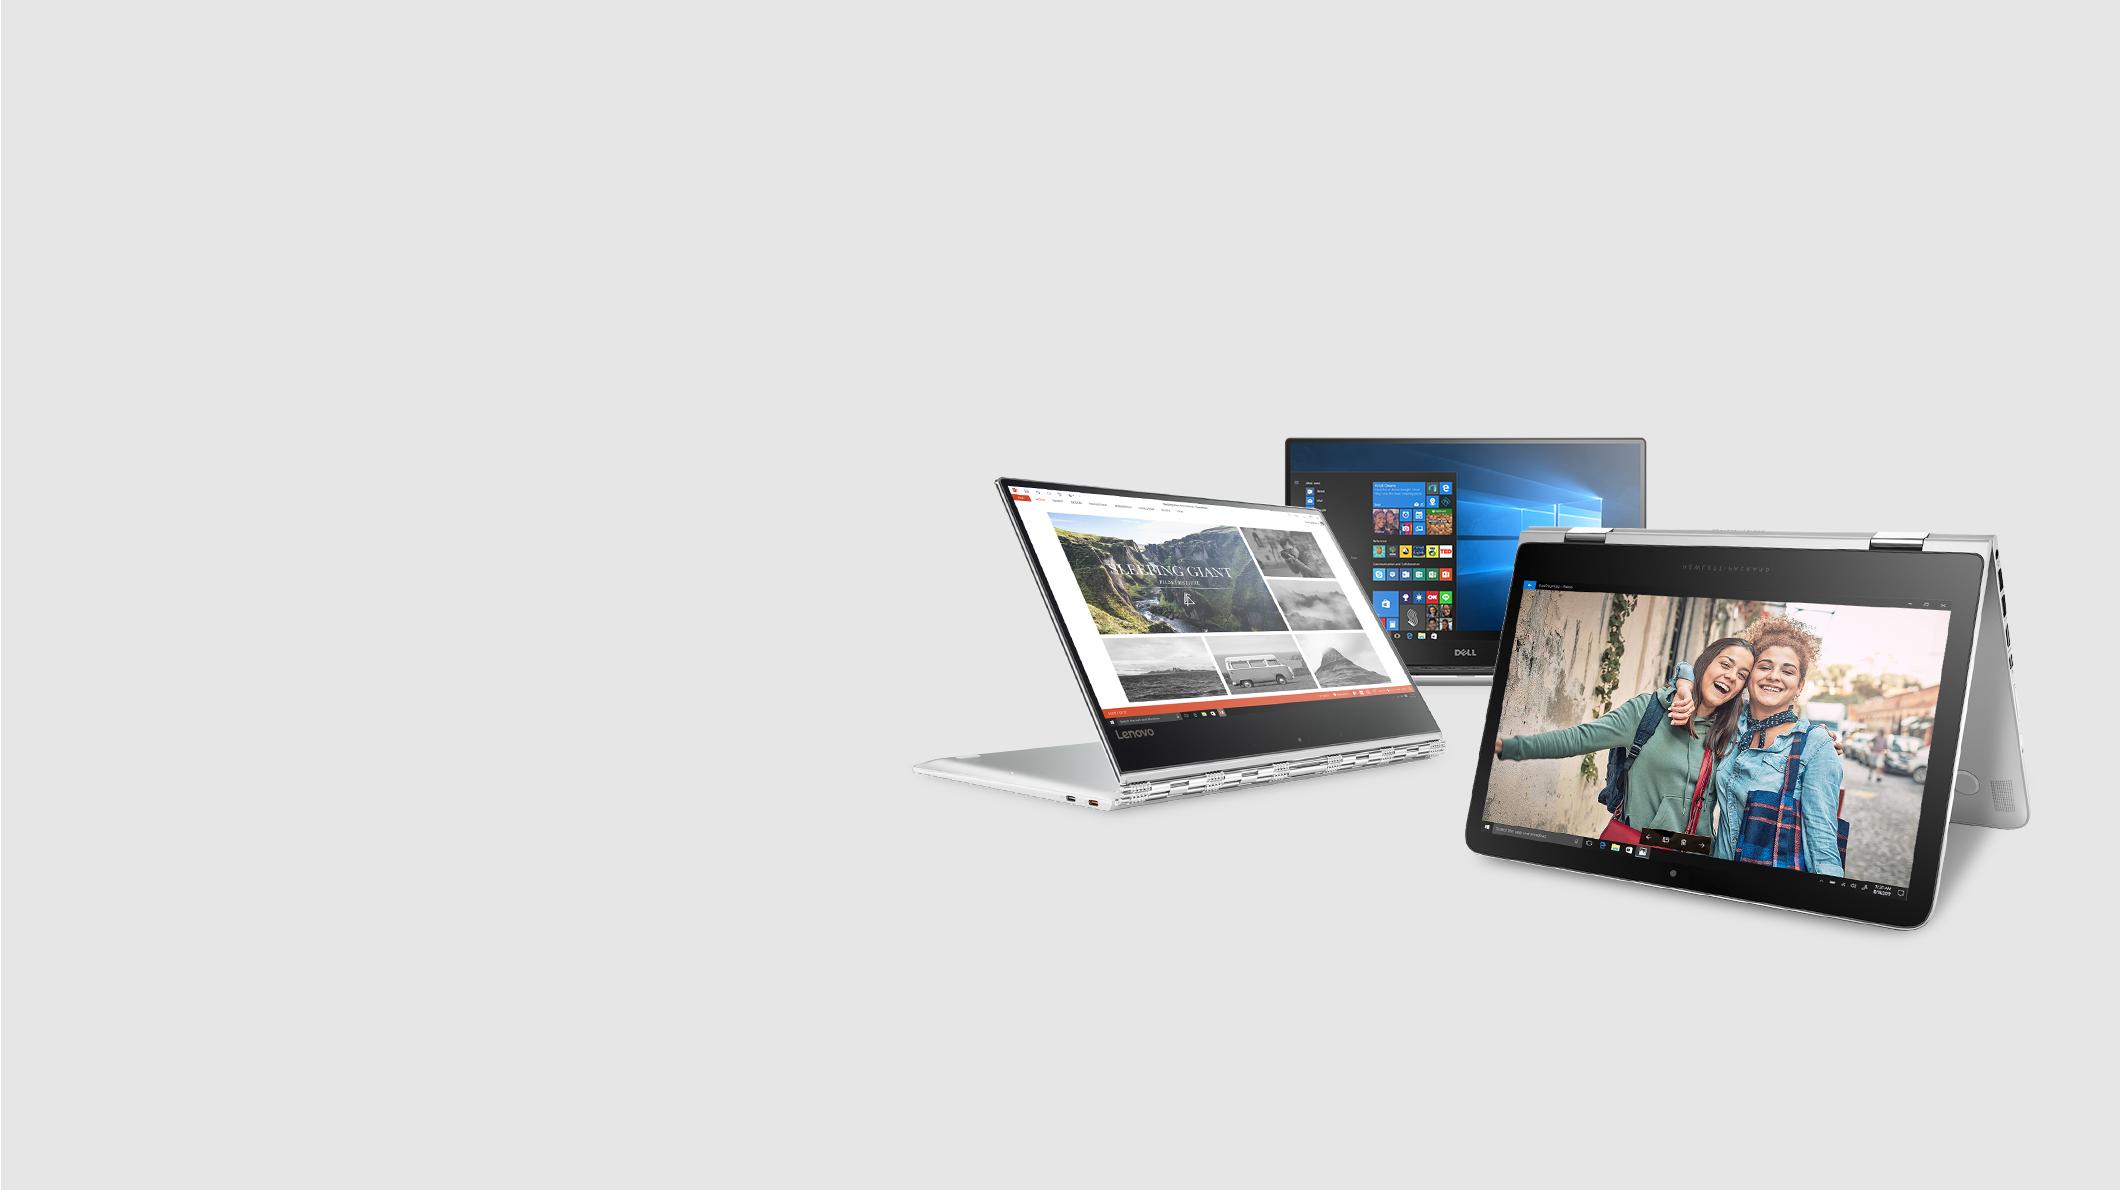 Three Windows PCs